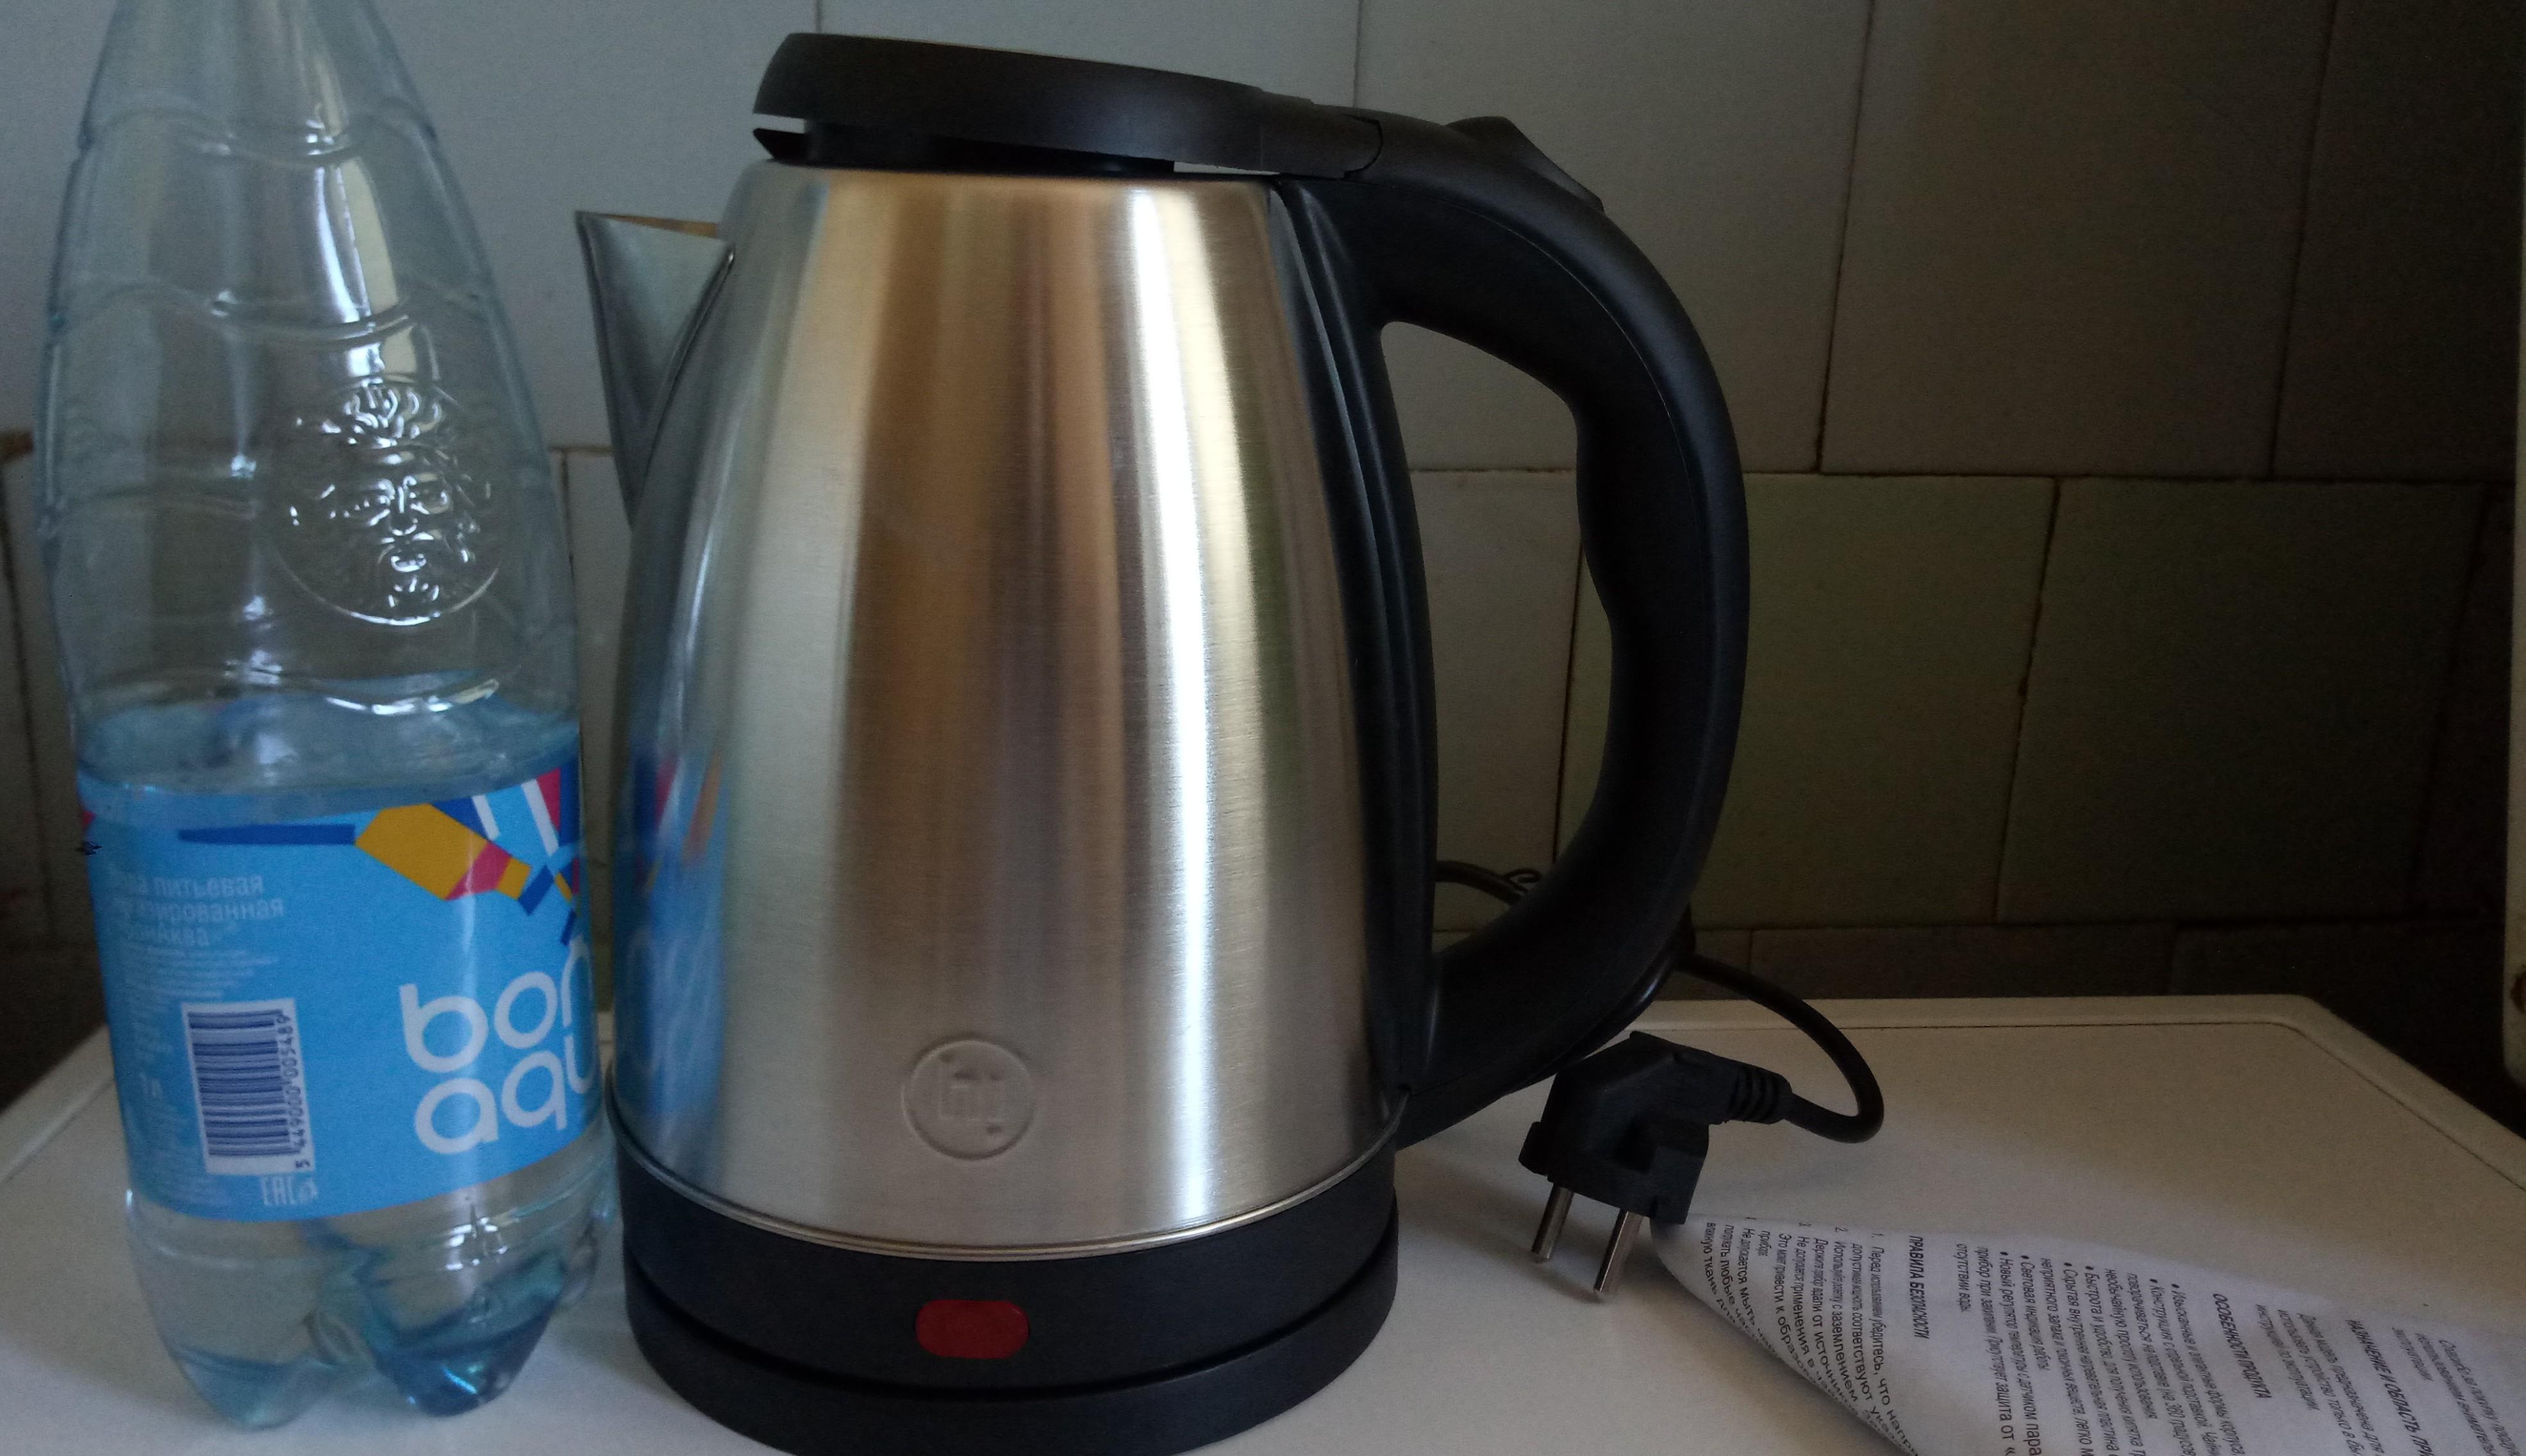 Обзор на чайник Hi EK-18S03